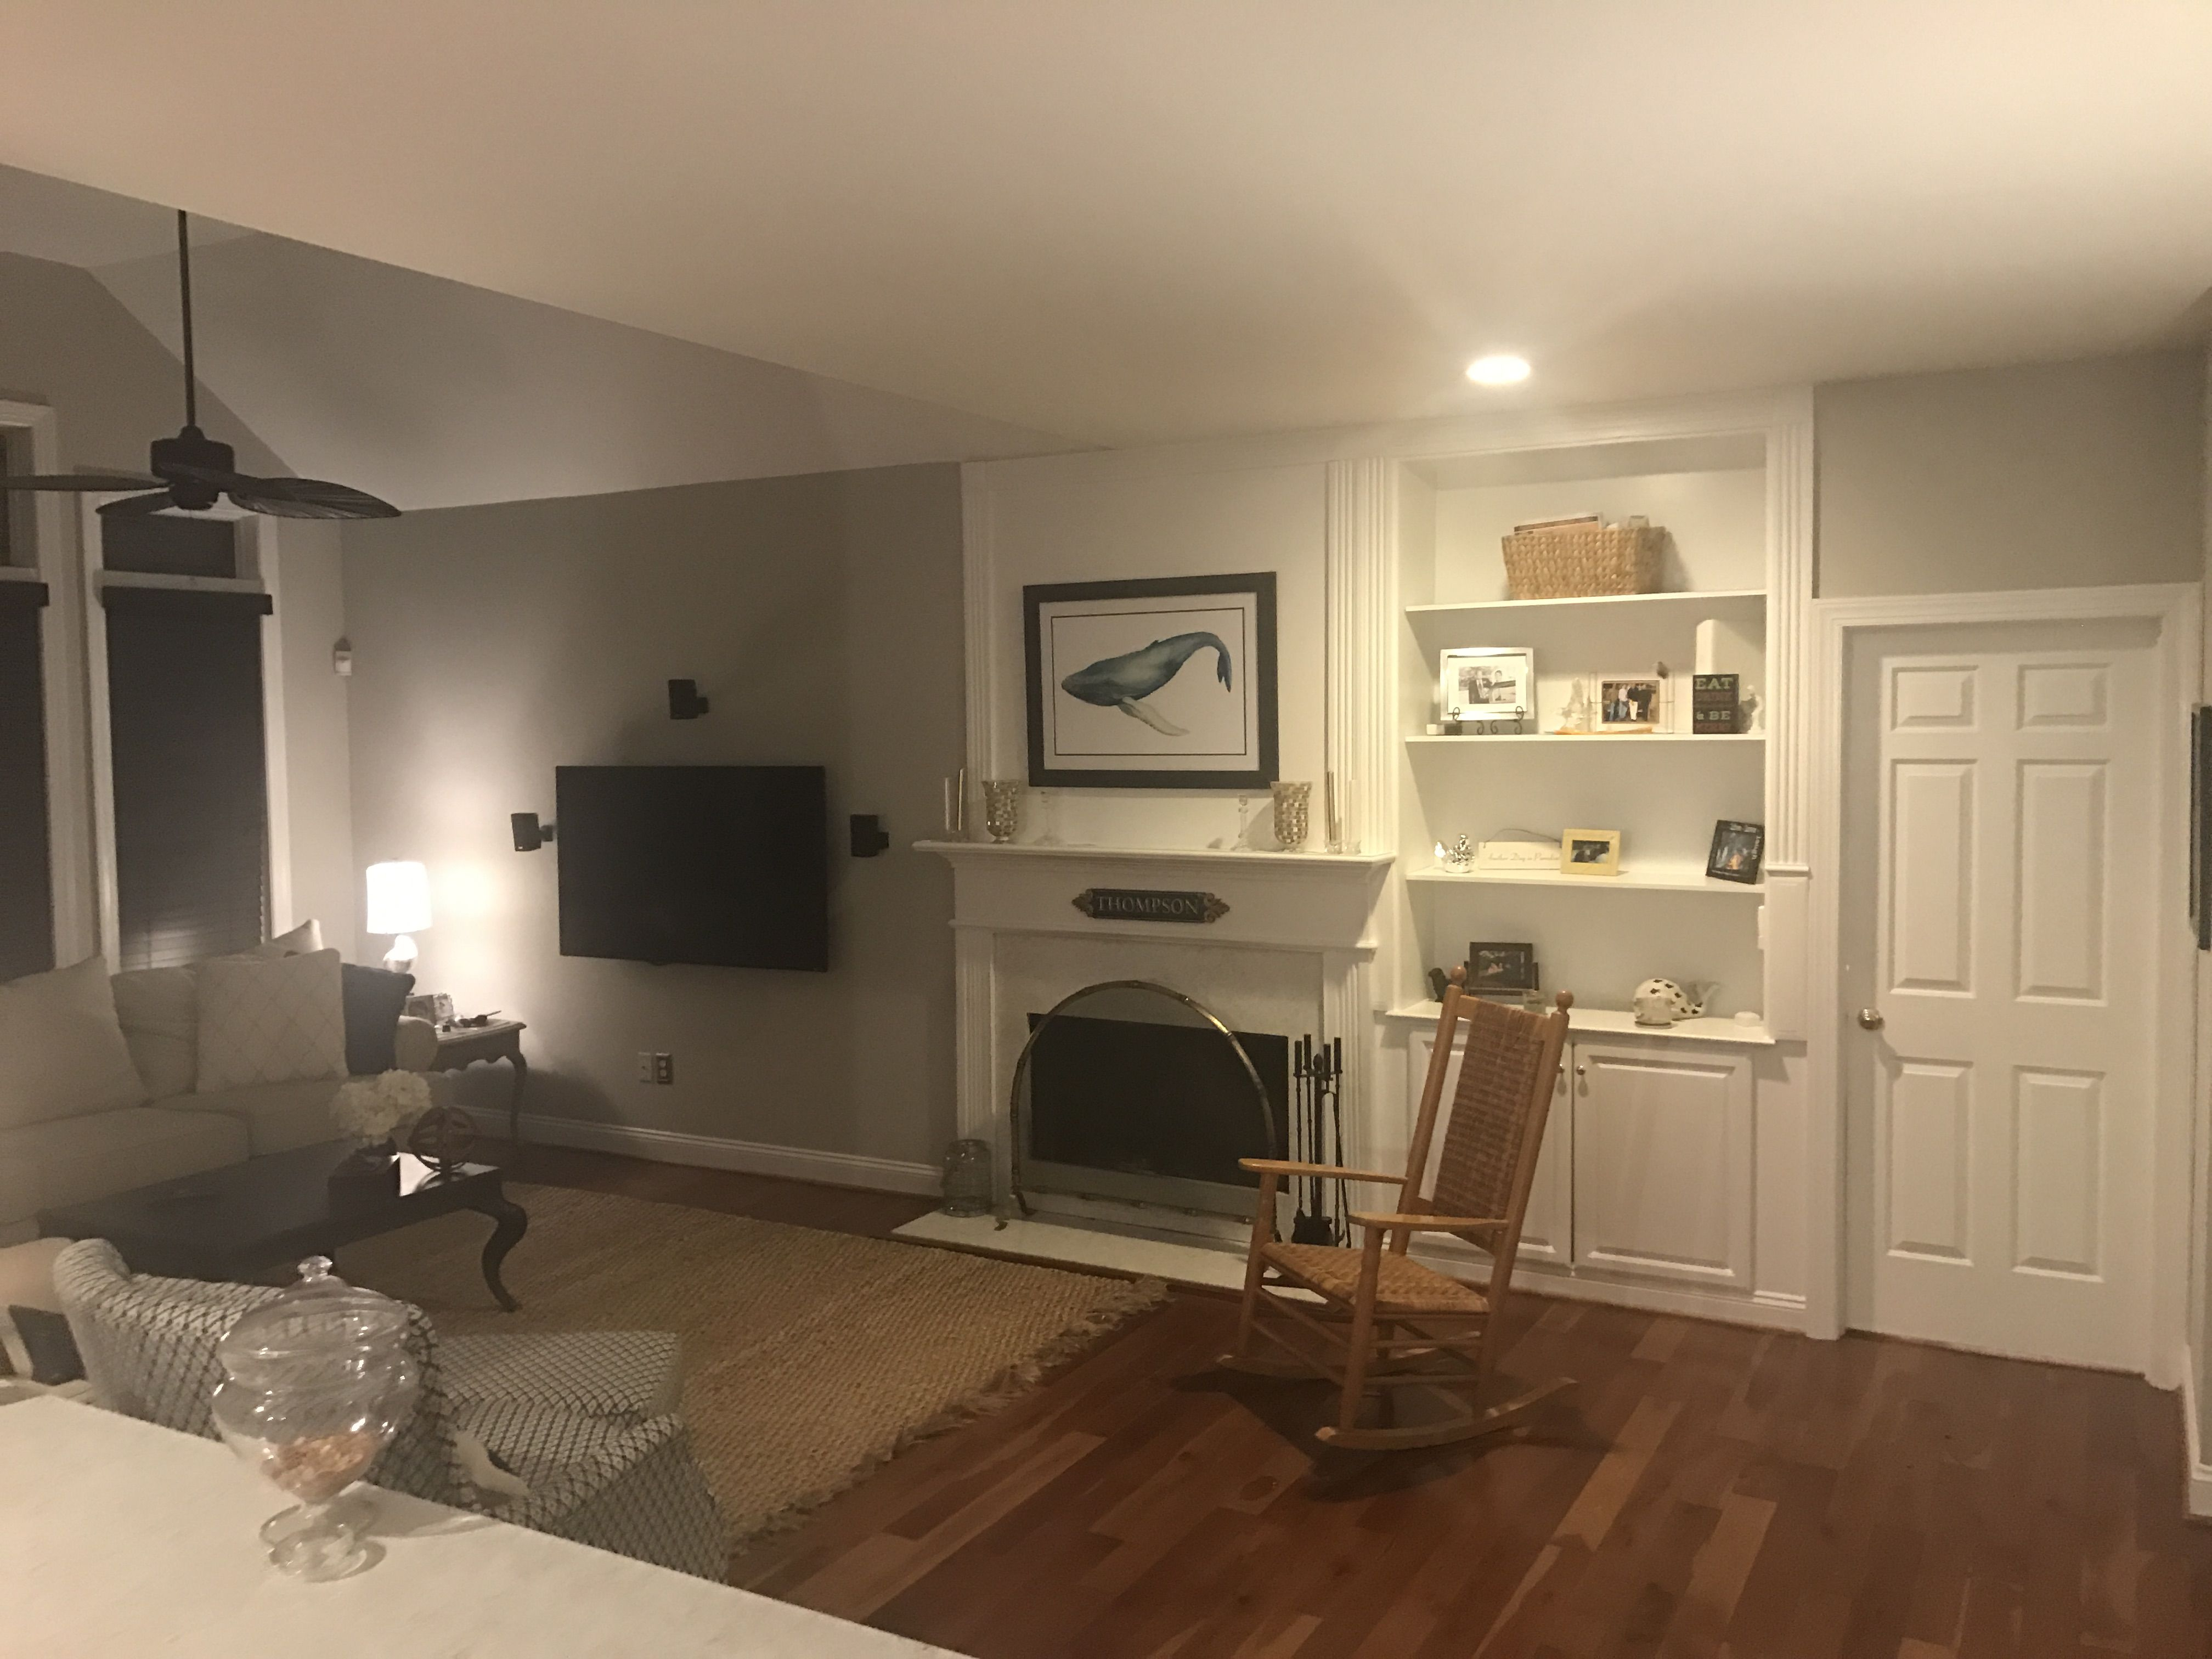 fireplace surround: quartz in lusso fireplace screen: ballard